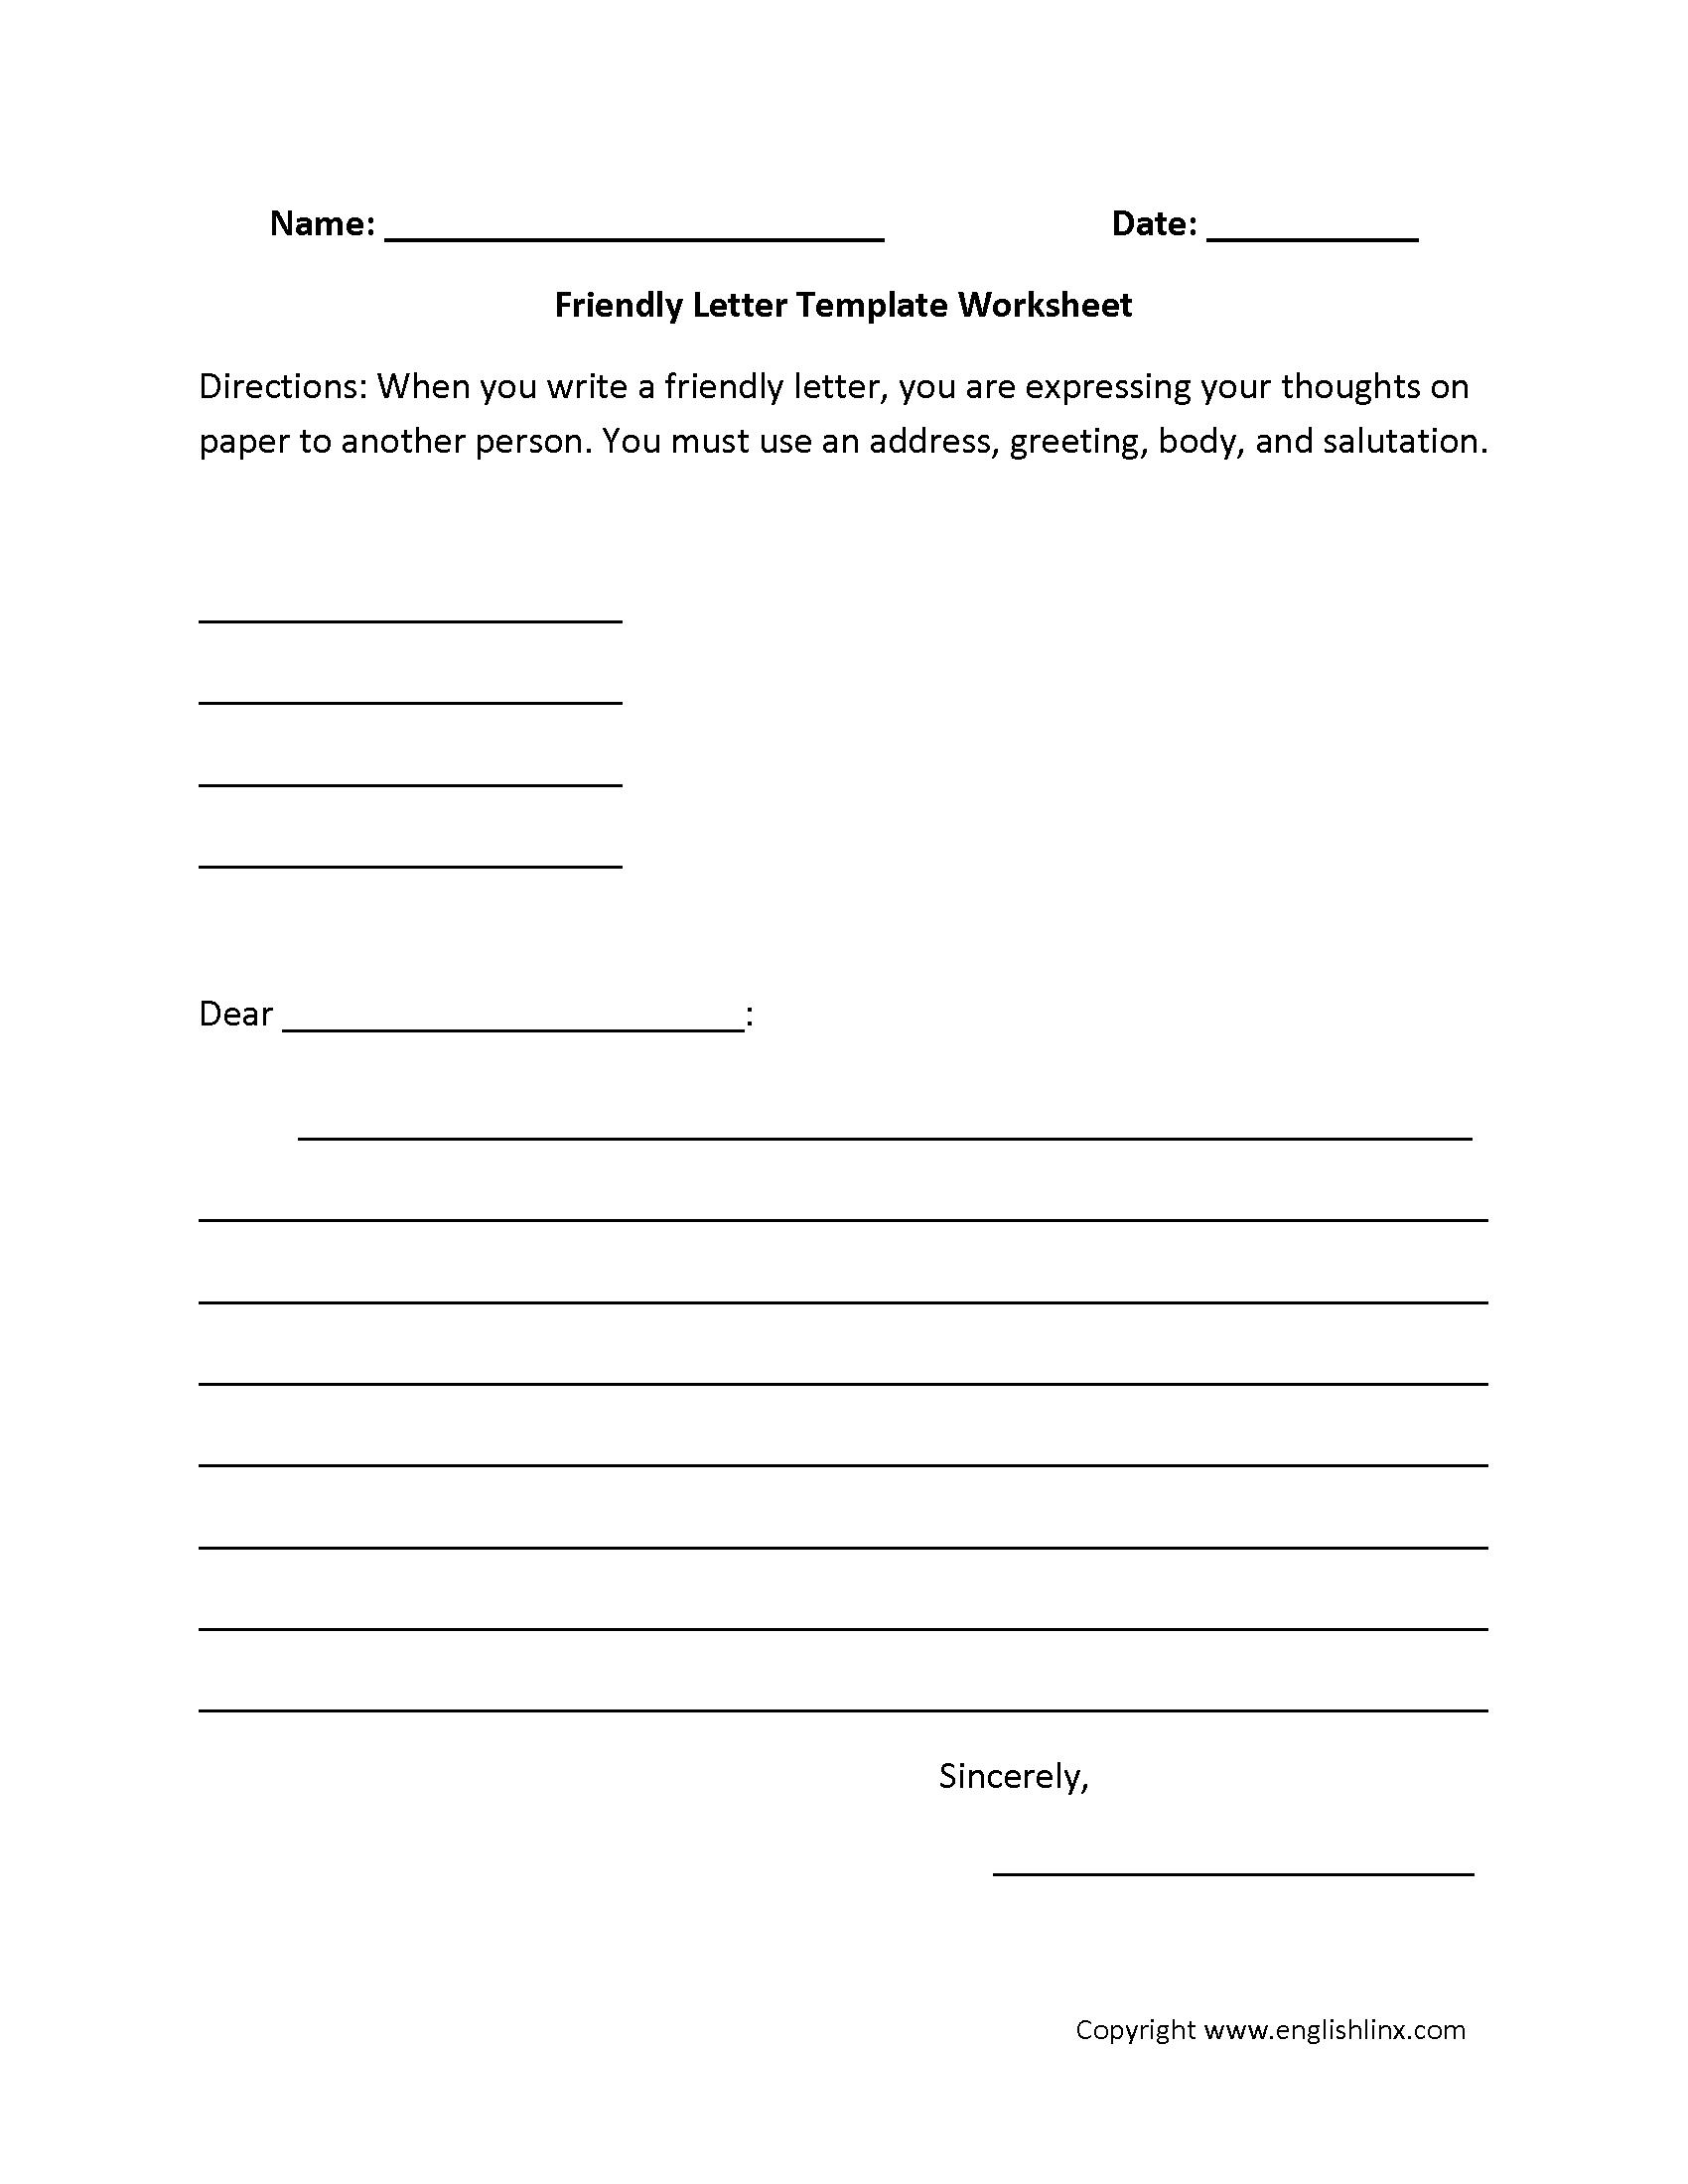 Writing Worksheets   Letter Writing Worksheets - 6Th Grade Writing Worksheets Printable Free